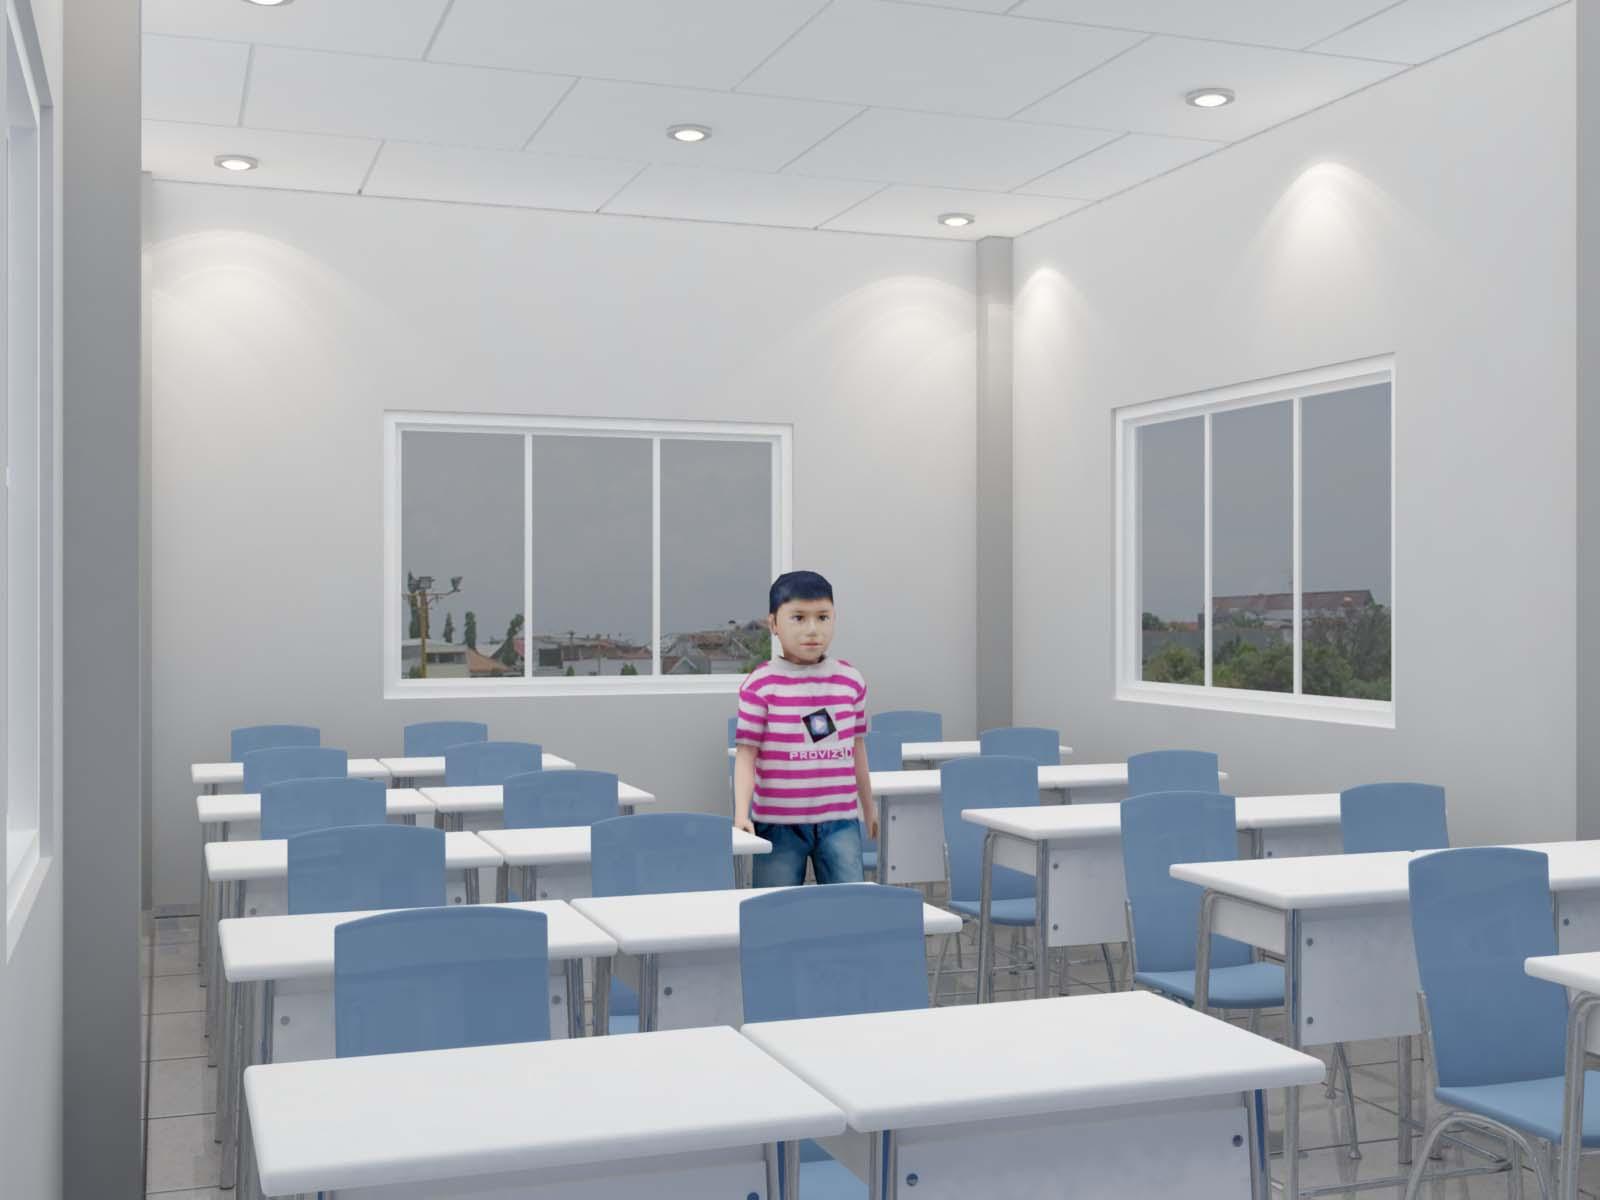 JASA DESAIN 3D SOLIDWORKS SKETCHUP TEXTURE Jasa desain